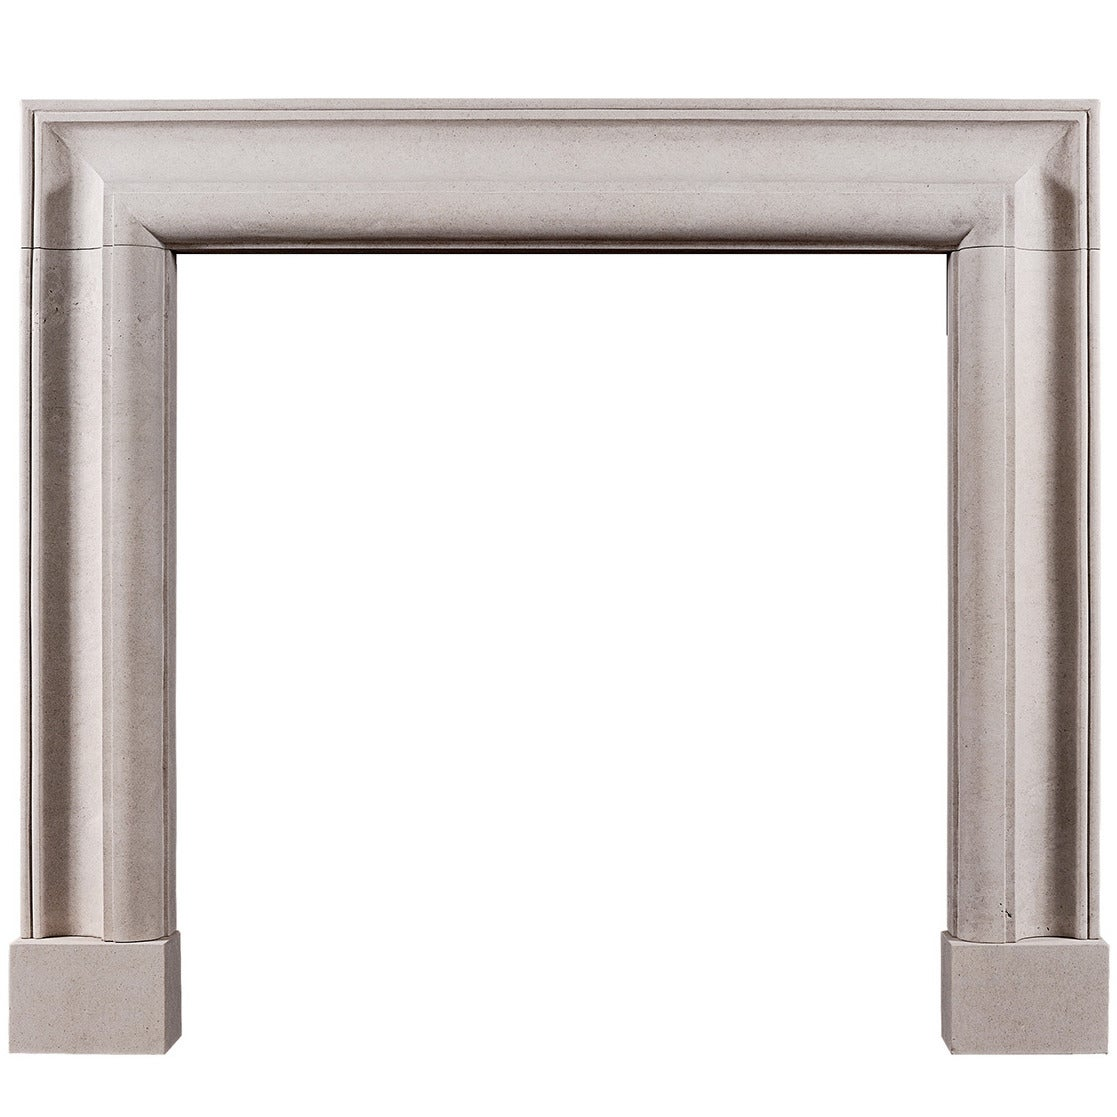 english bolection fireplace mantel in portland limestone for sale